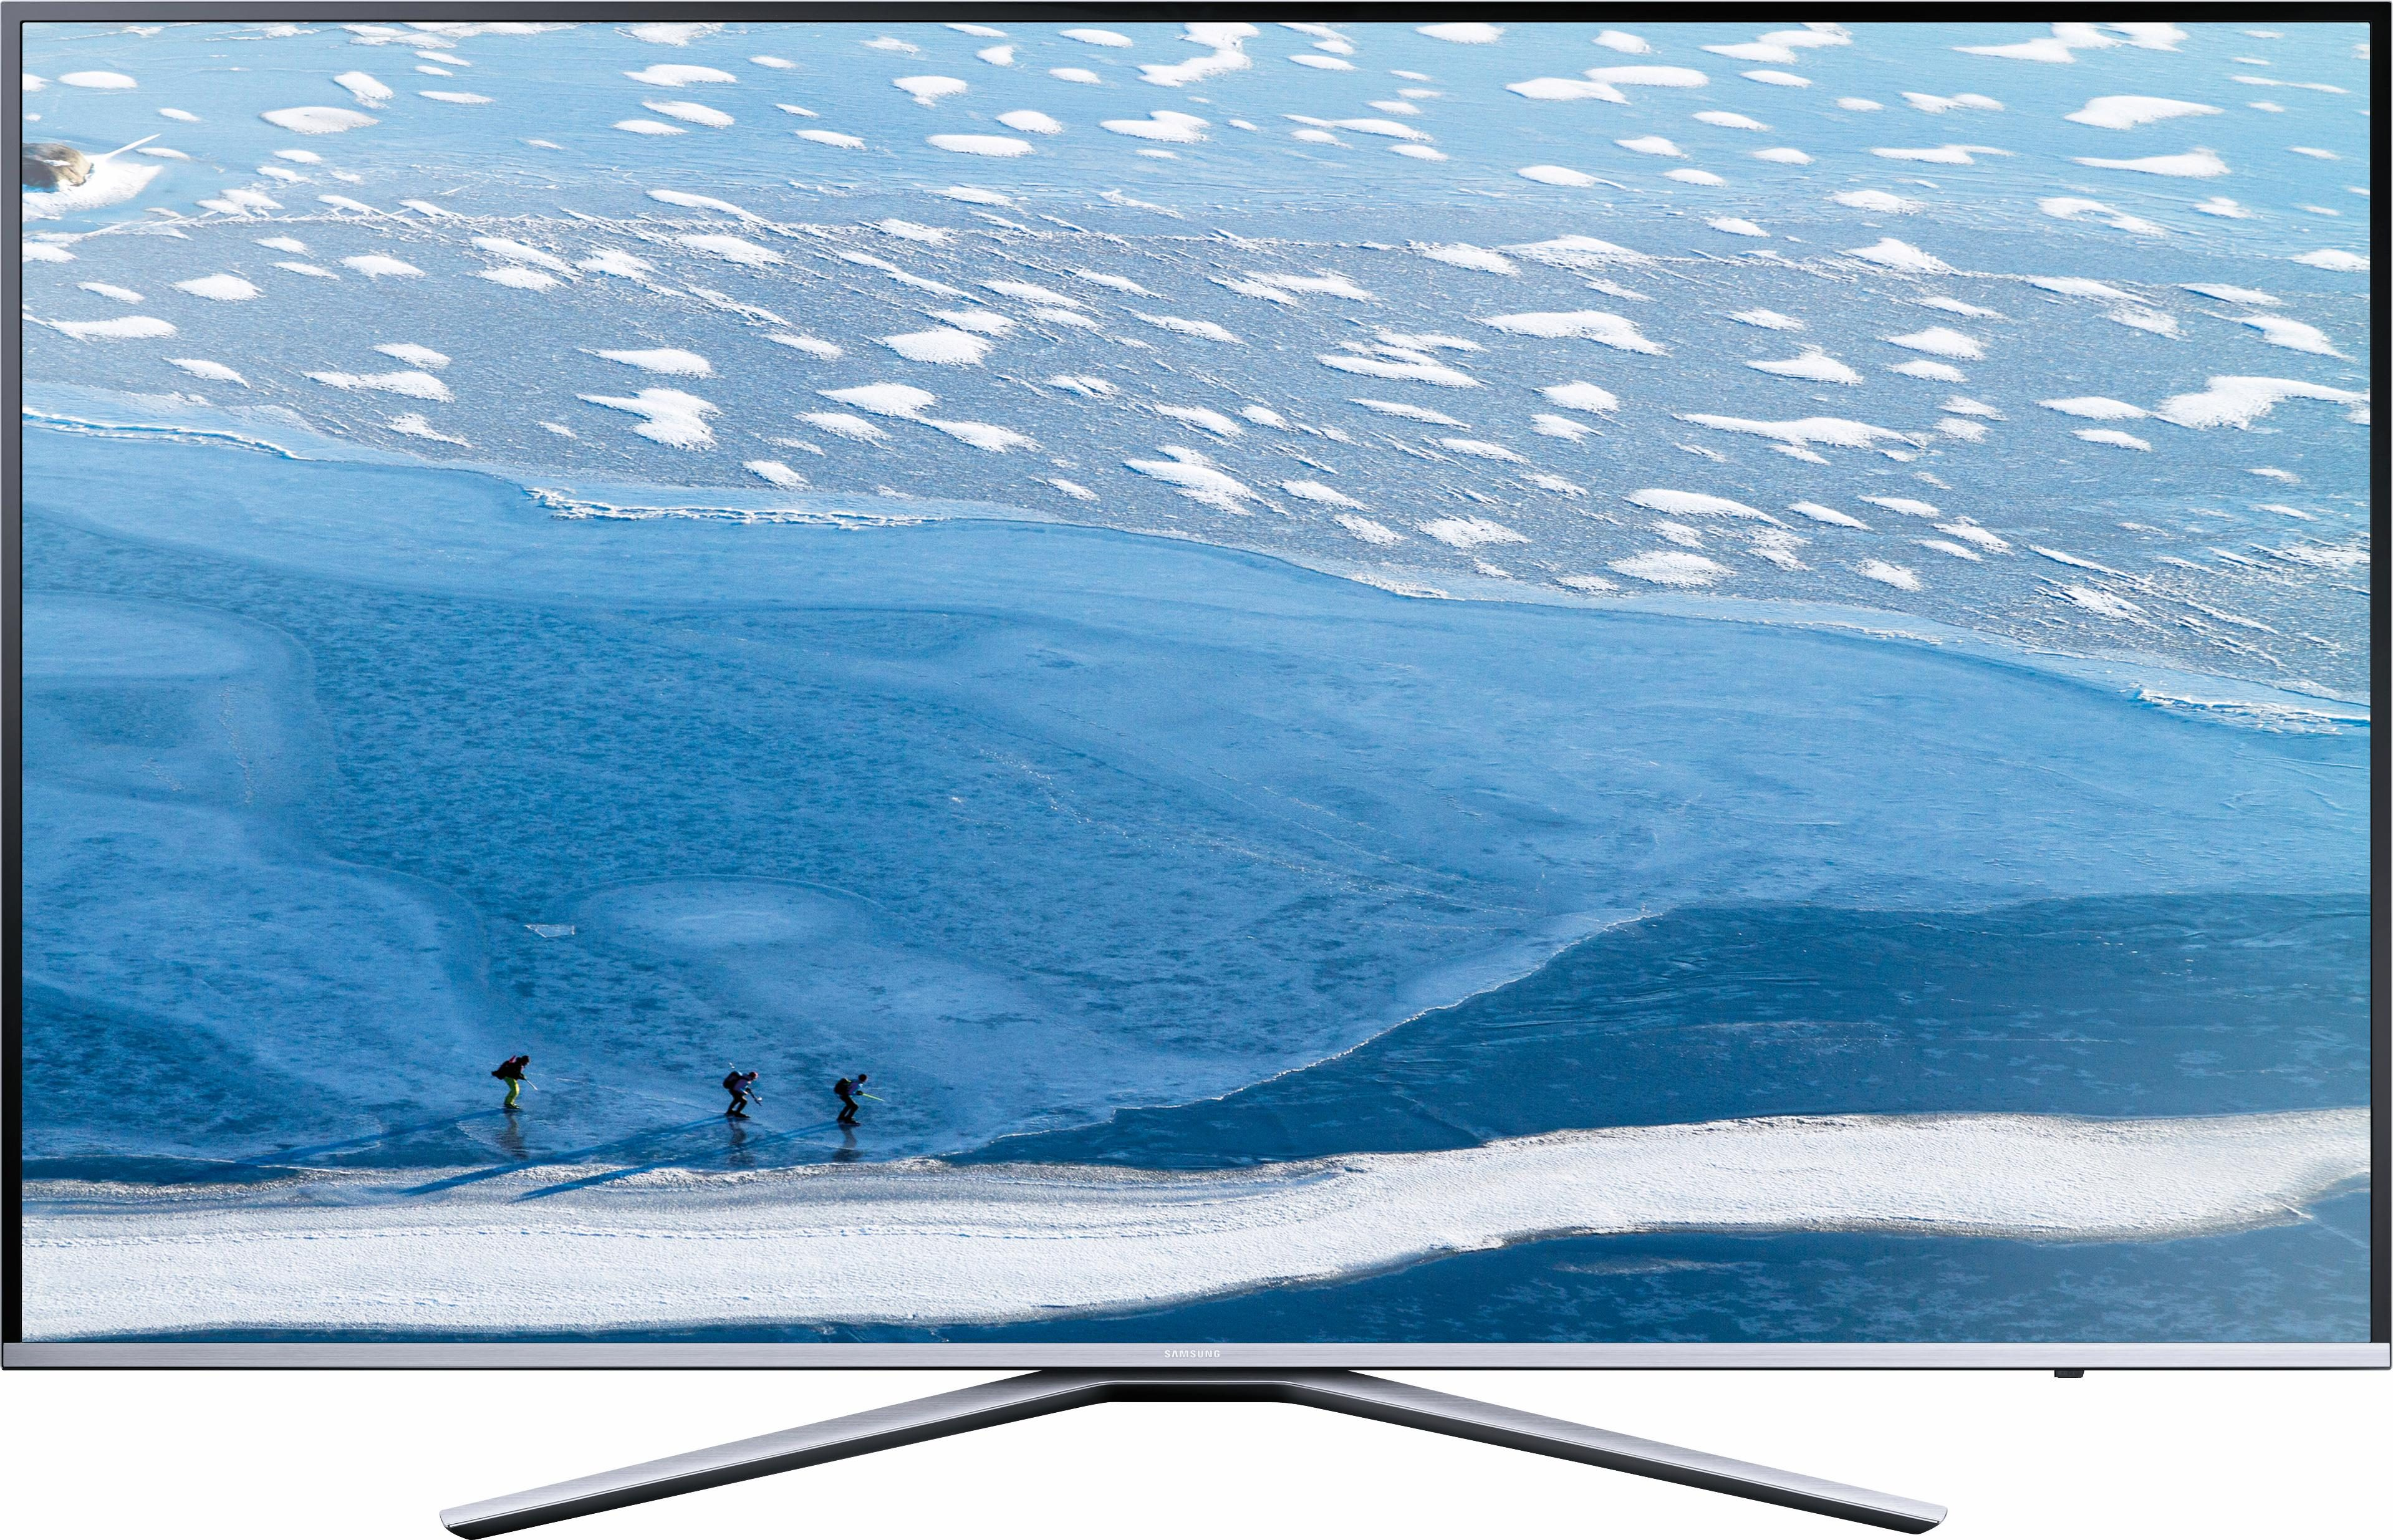 Samsung UE43KU6409UXZG, LED Fernseher, 108 cm (43 Zoll), 2160p (4K Ultra HD), Smart-TV